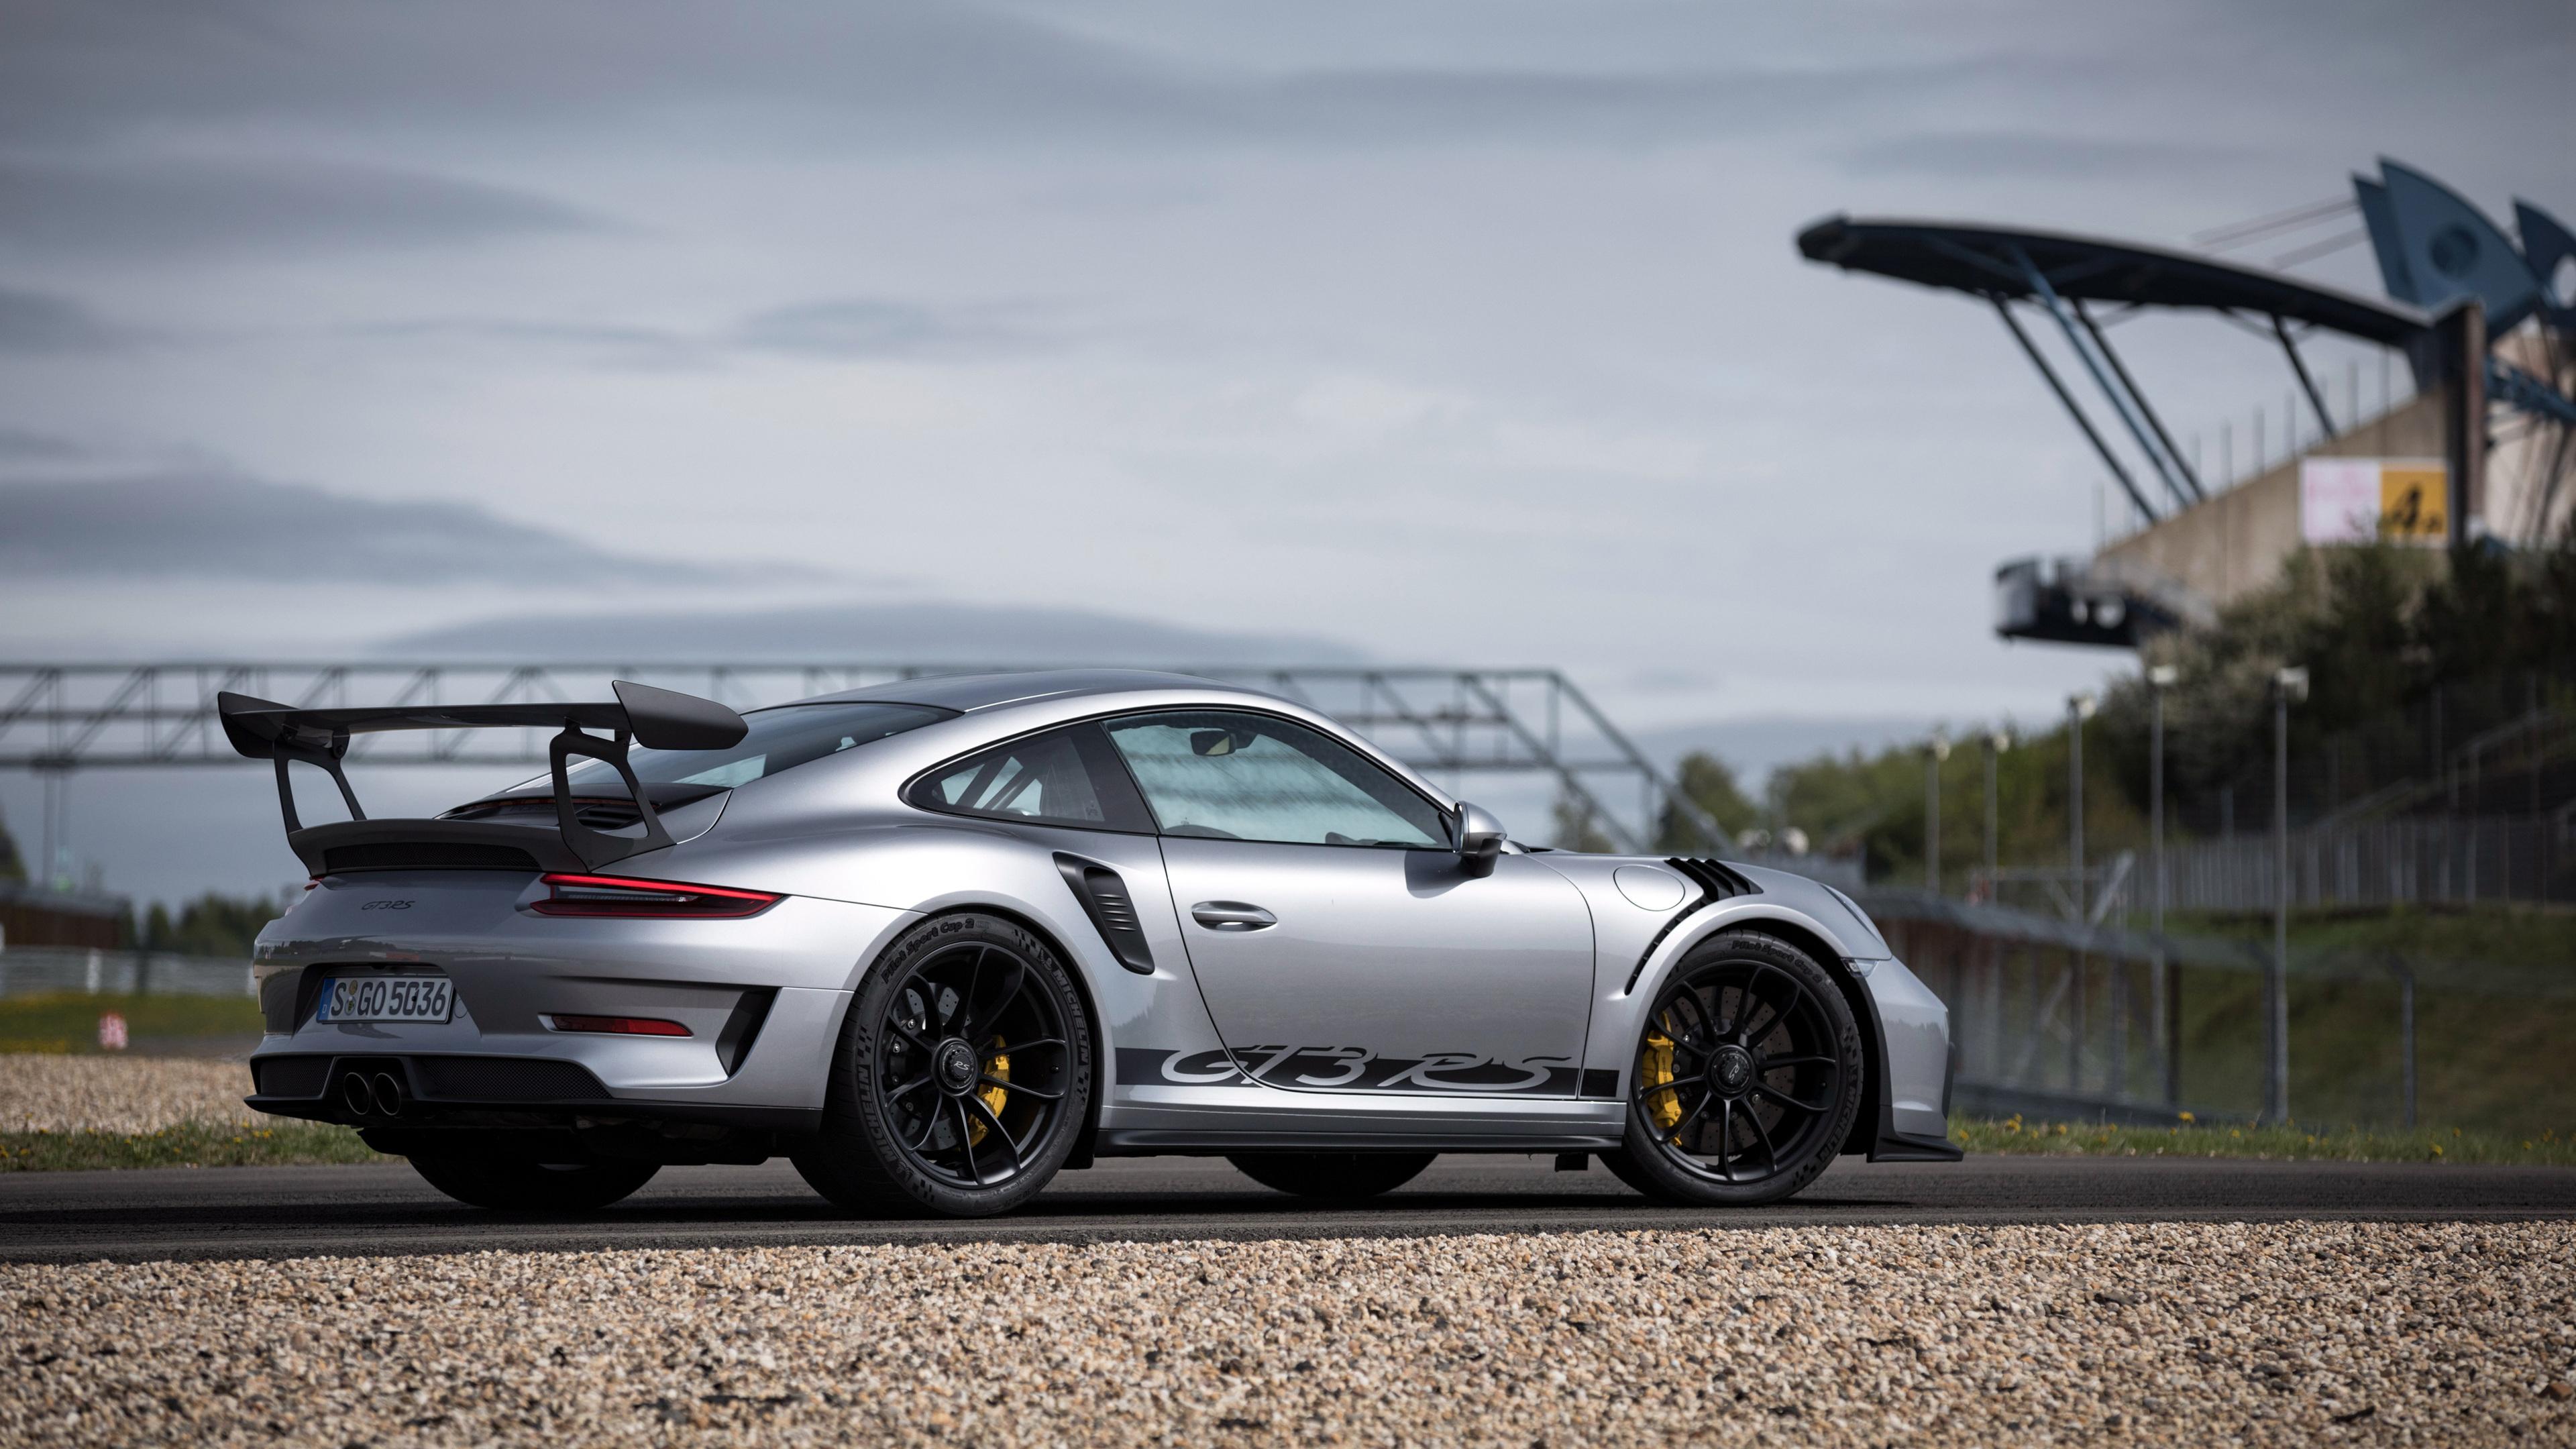 4k porsche 911 gt3 rs 1539110882 - 4k Porsche 911 GT3 RS - porsche wallpapers, porsche 911 wallpapers, hd-wallpapers, cars wallpapers, 4k-wallpapers, 2018 cars wallpapers